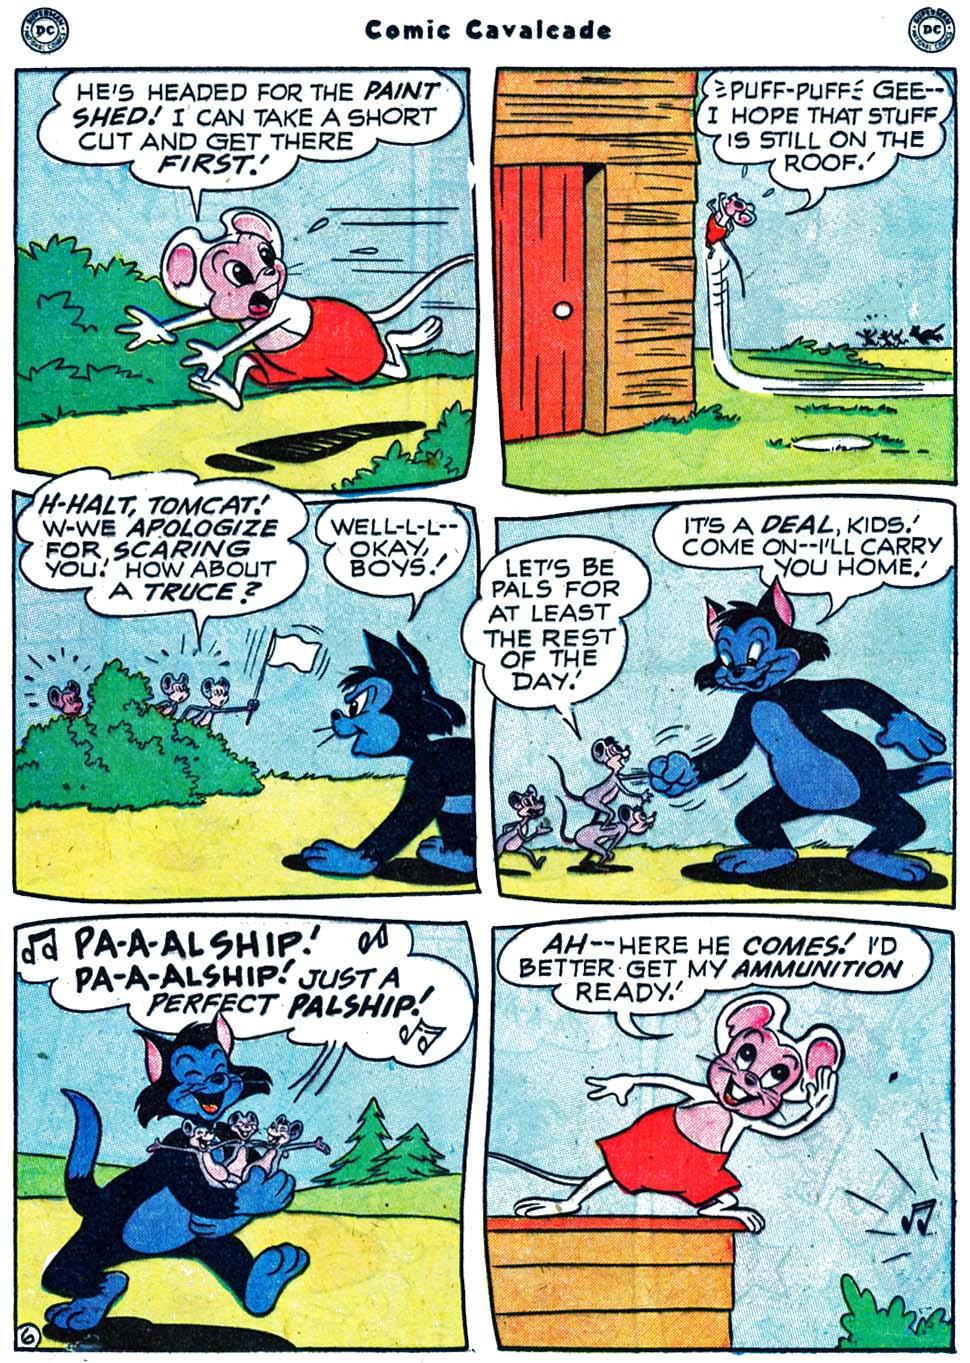 Comic Cavalcade issue 39 - Page 25